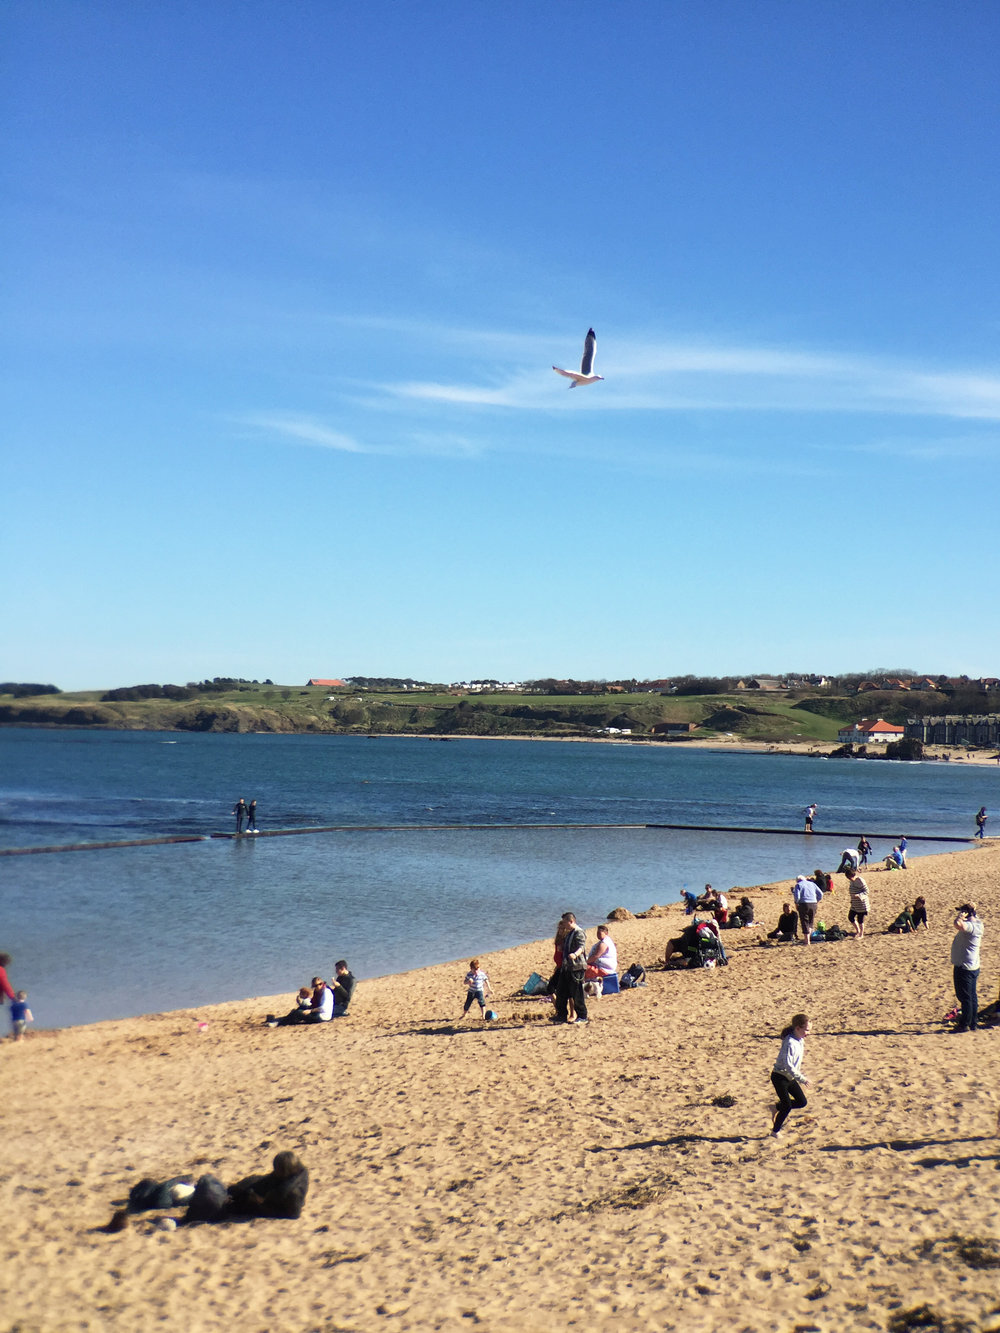 Beaches get plenty of use in Scotland, despite the cold water.